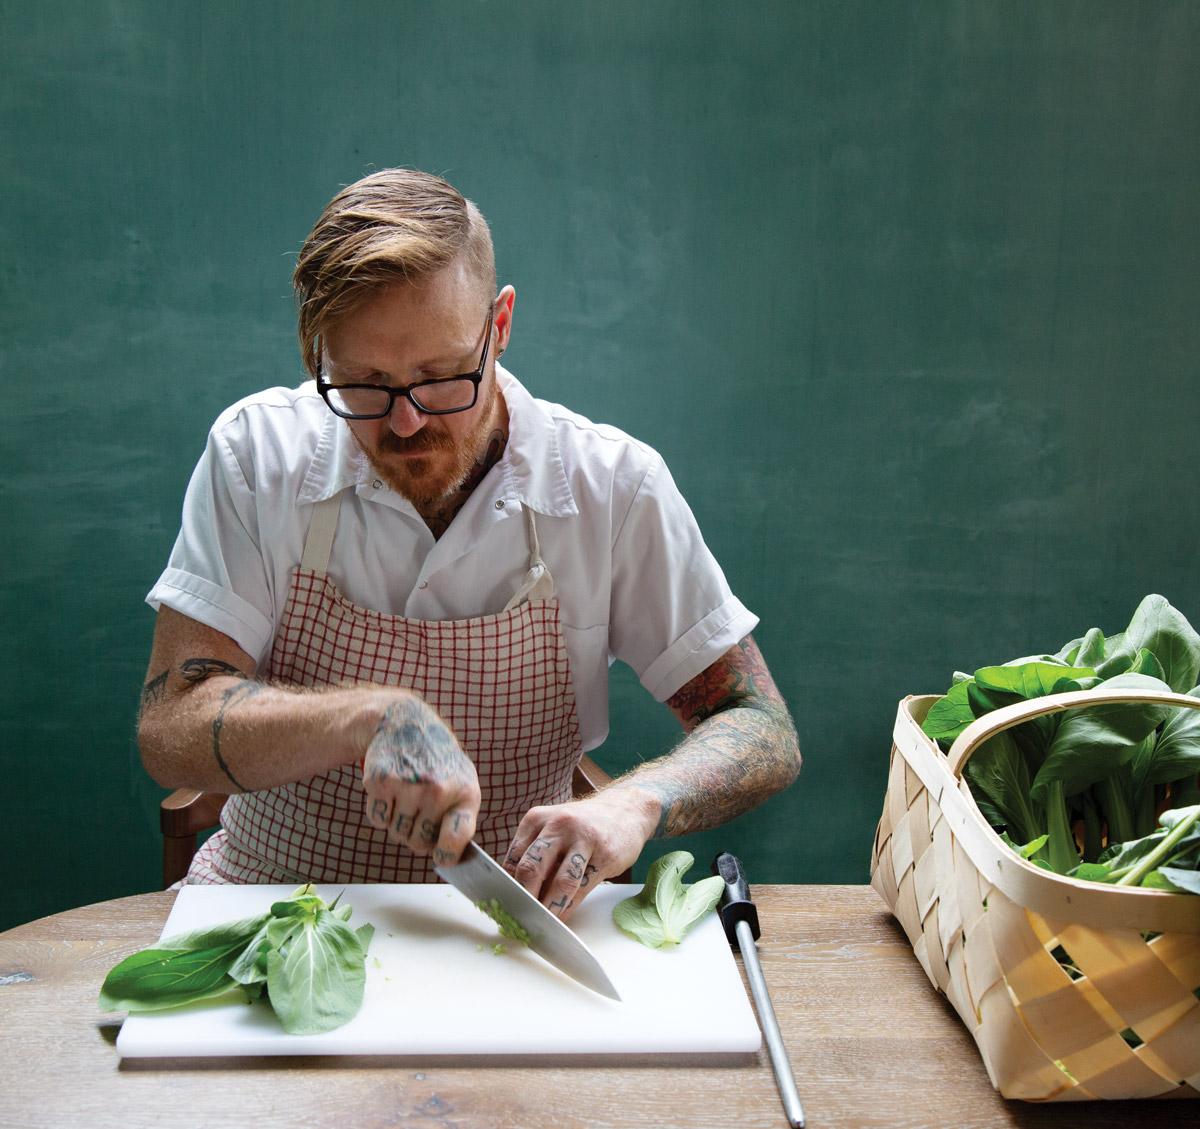 Redbird chef Zeb Stevenson cutting vegetables